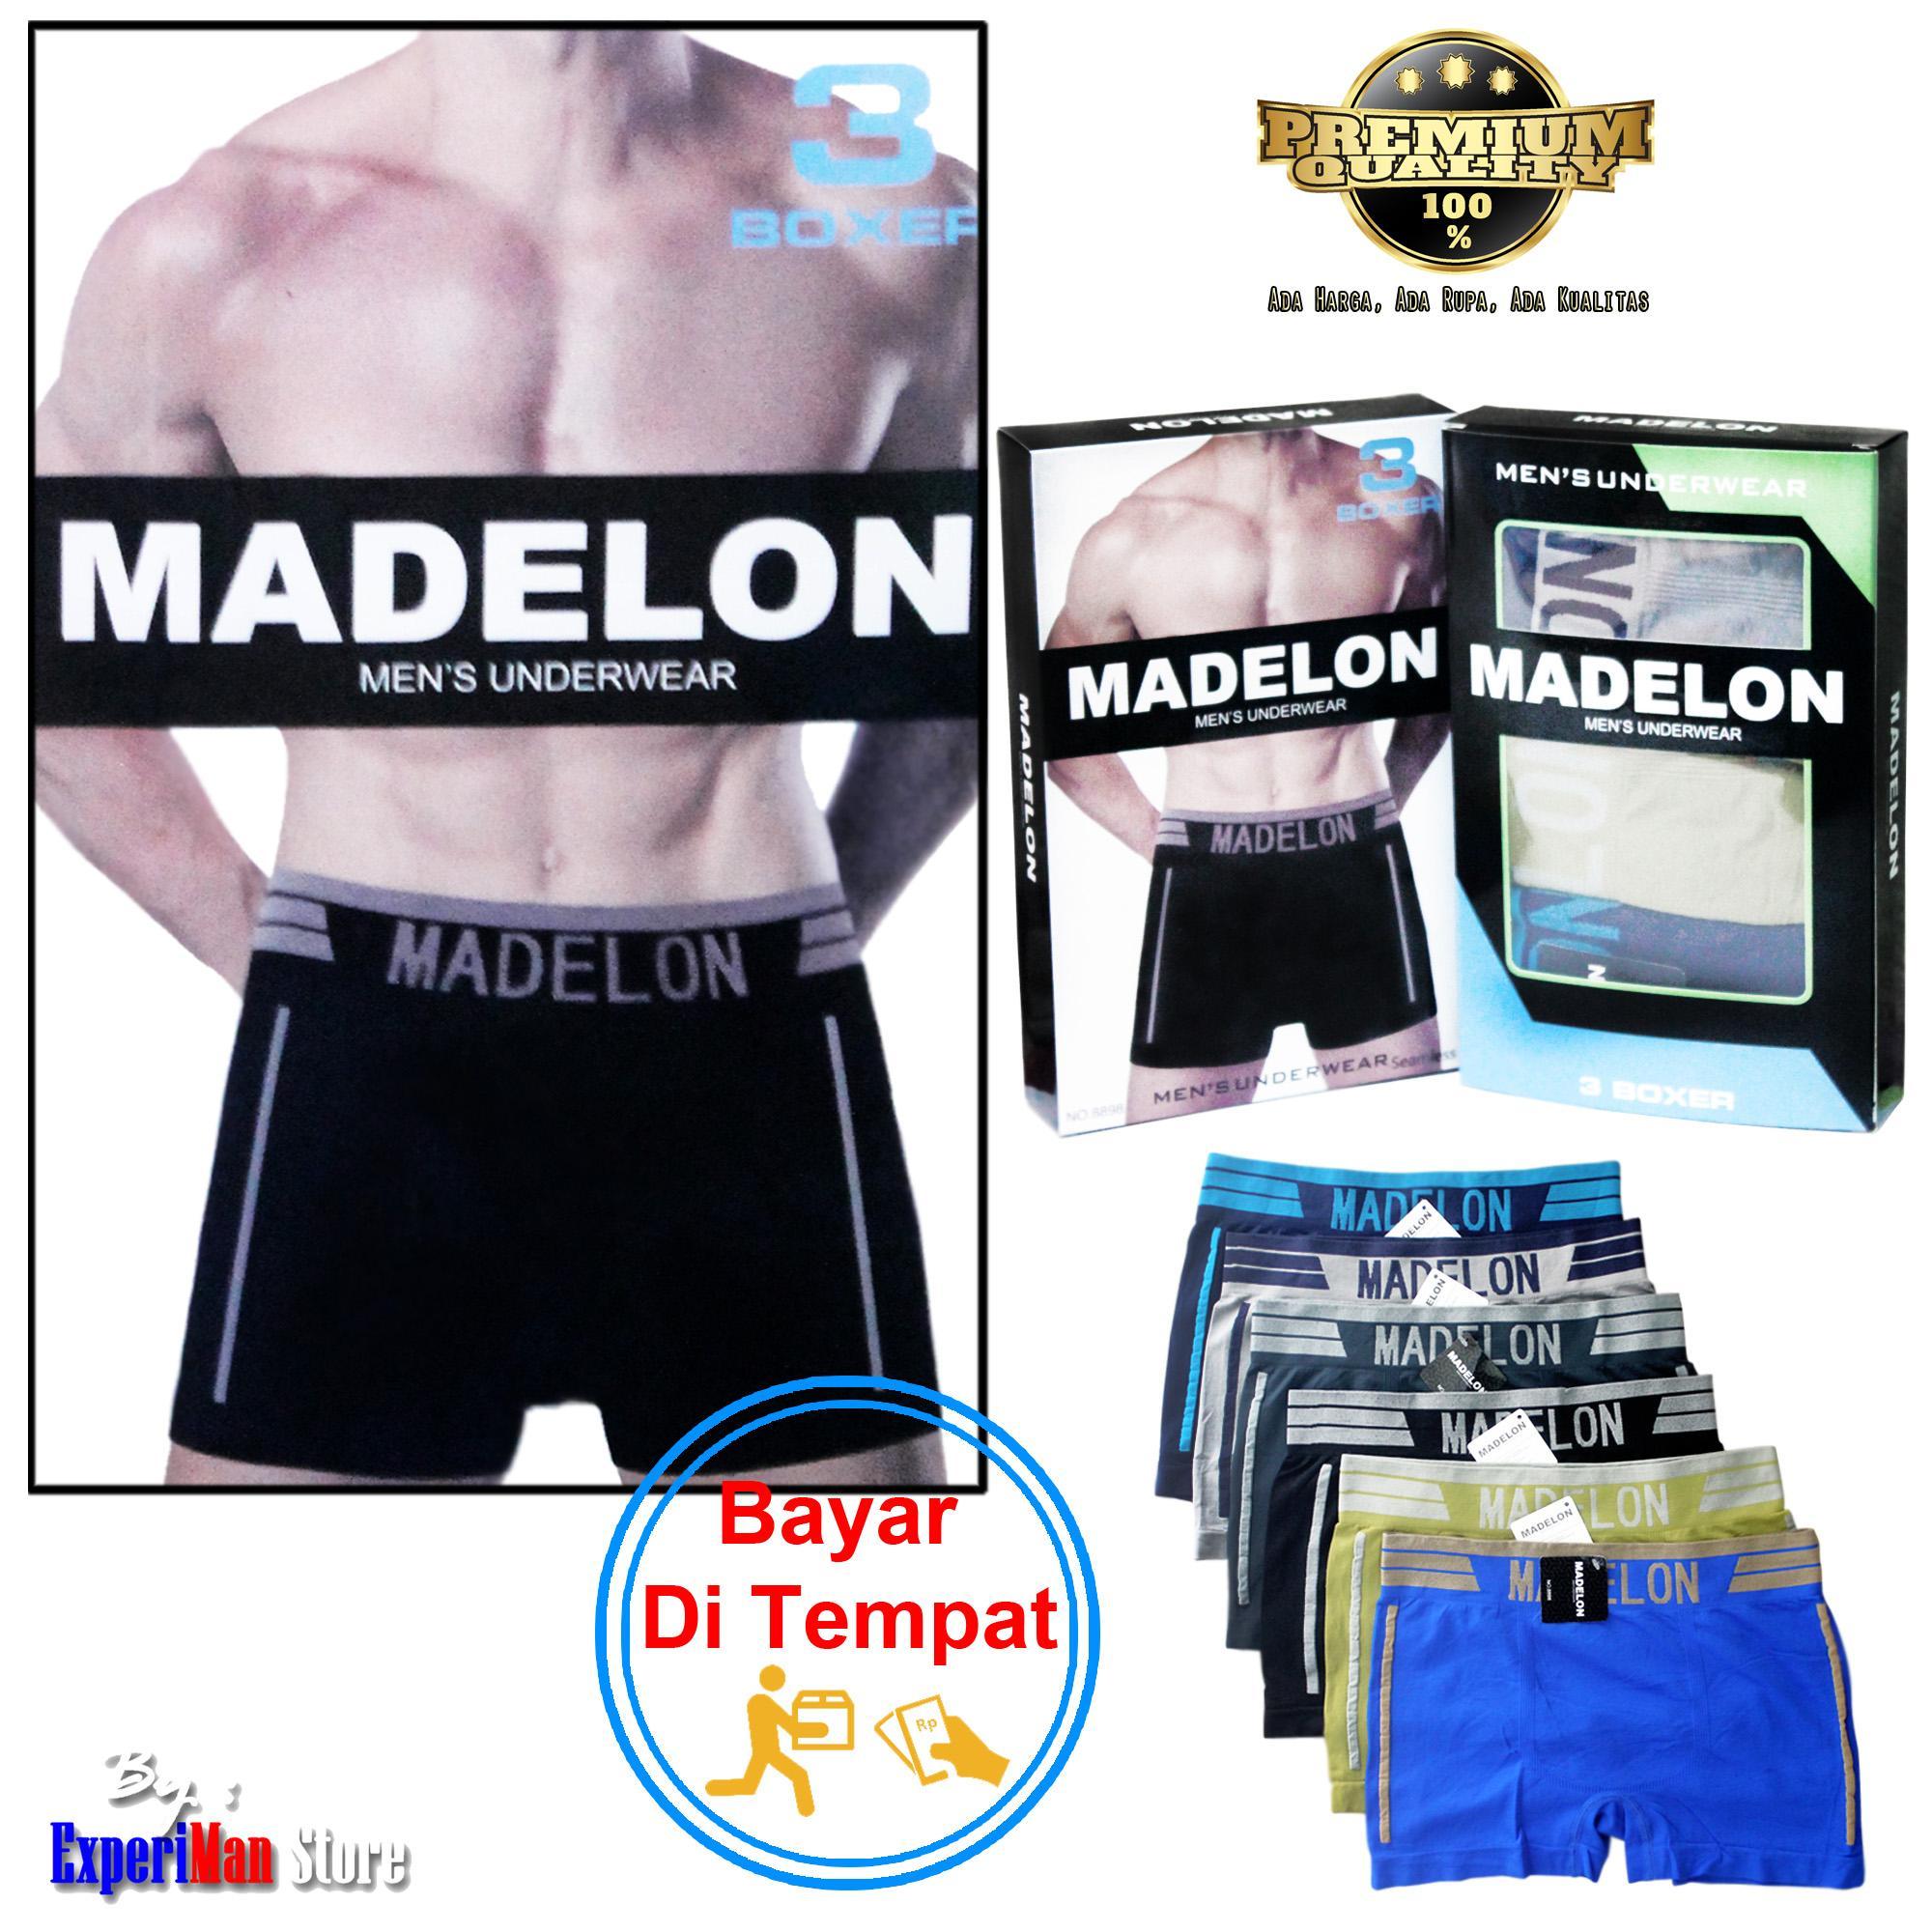 Pakaian Dalam Boxer Pria Termurah Celana Vakoou Usa Man Underwear Magnetic 3 Pcs Madelon Spandek Korea Rajut Tanpa Jahitan